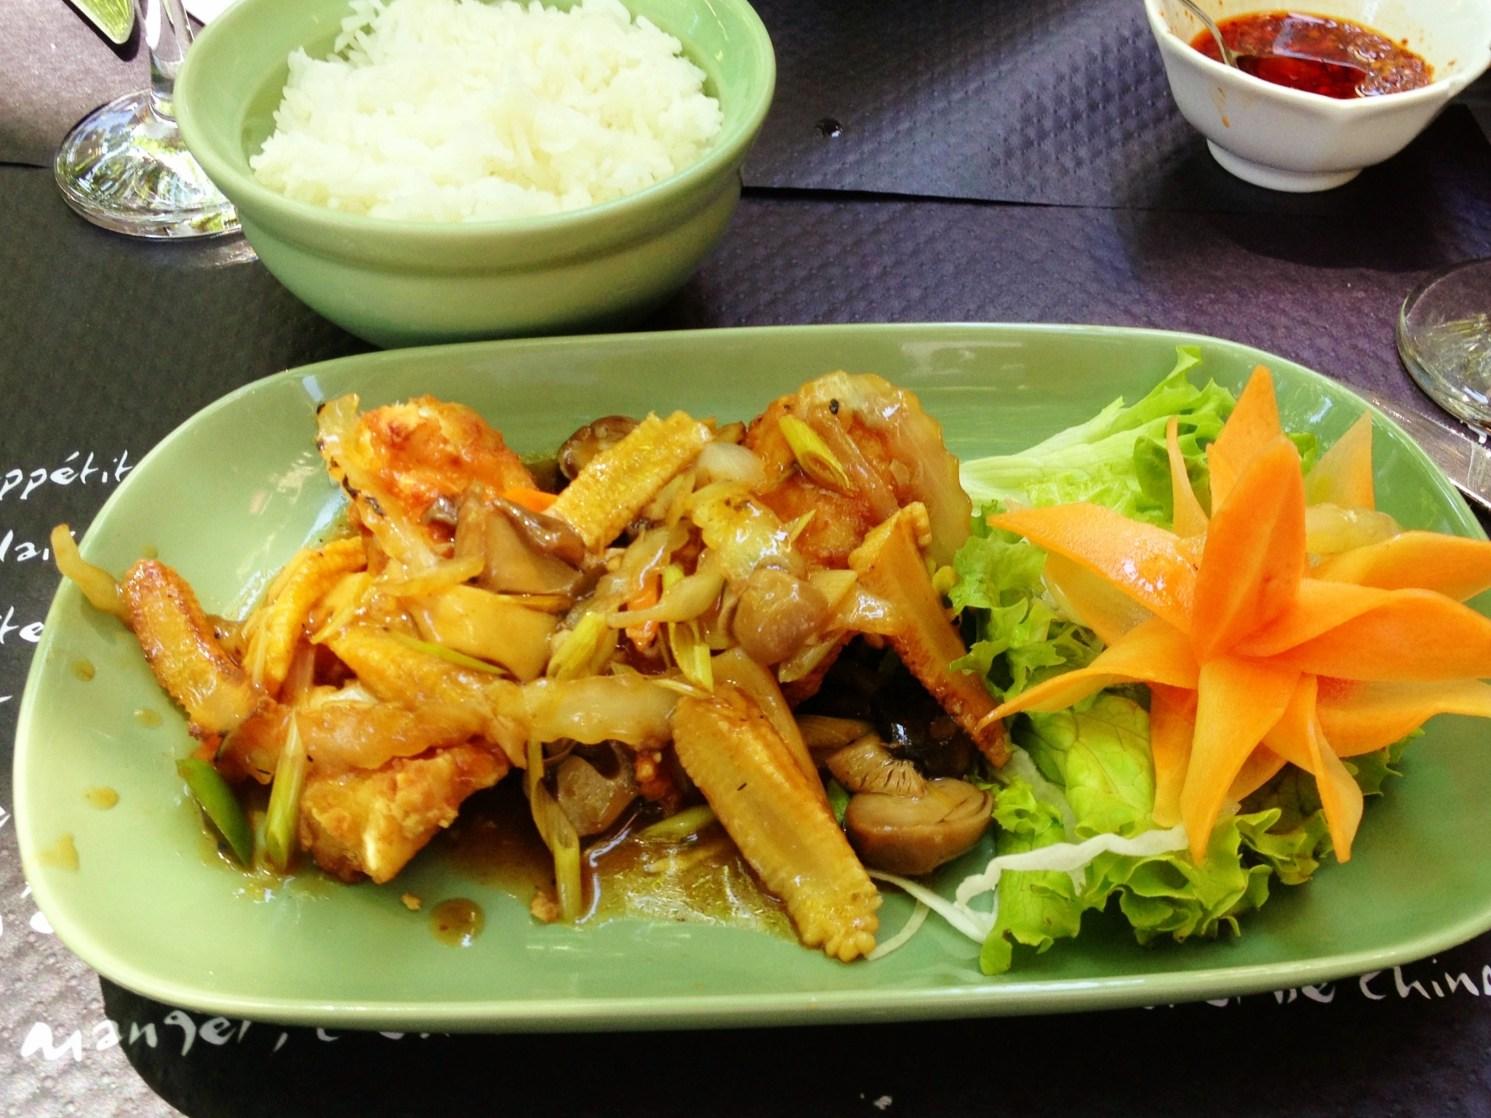 Thai food in France